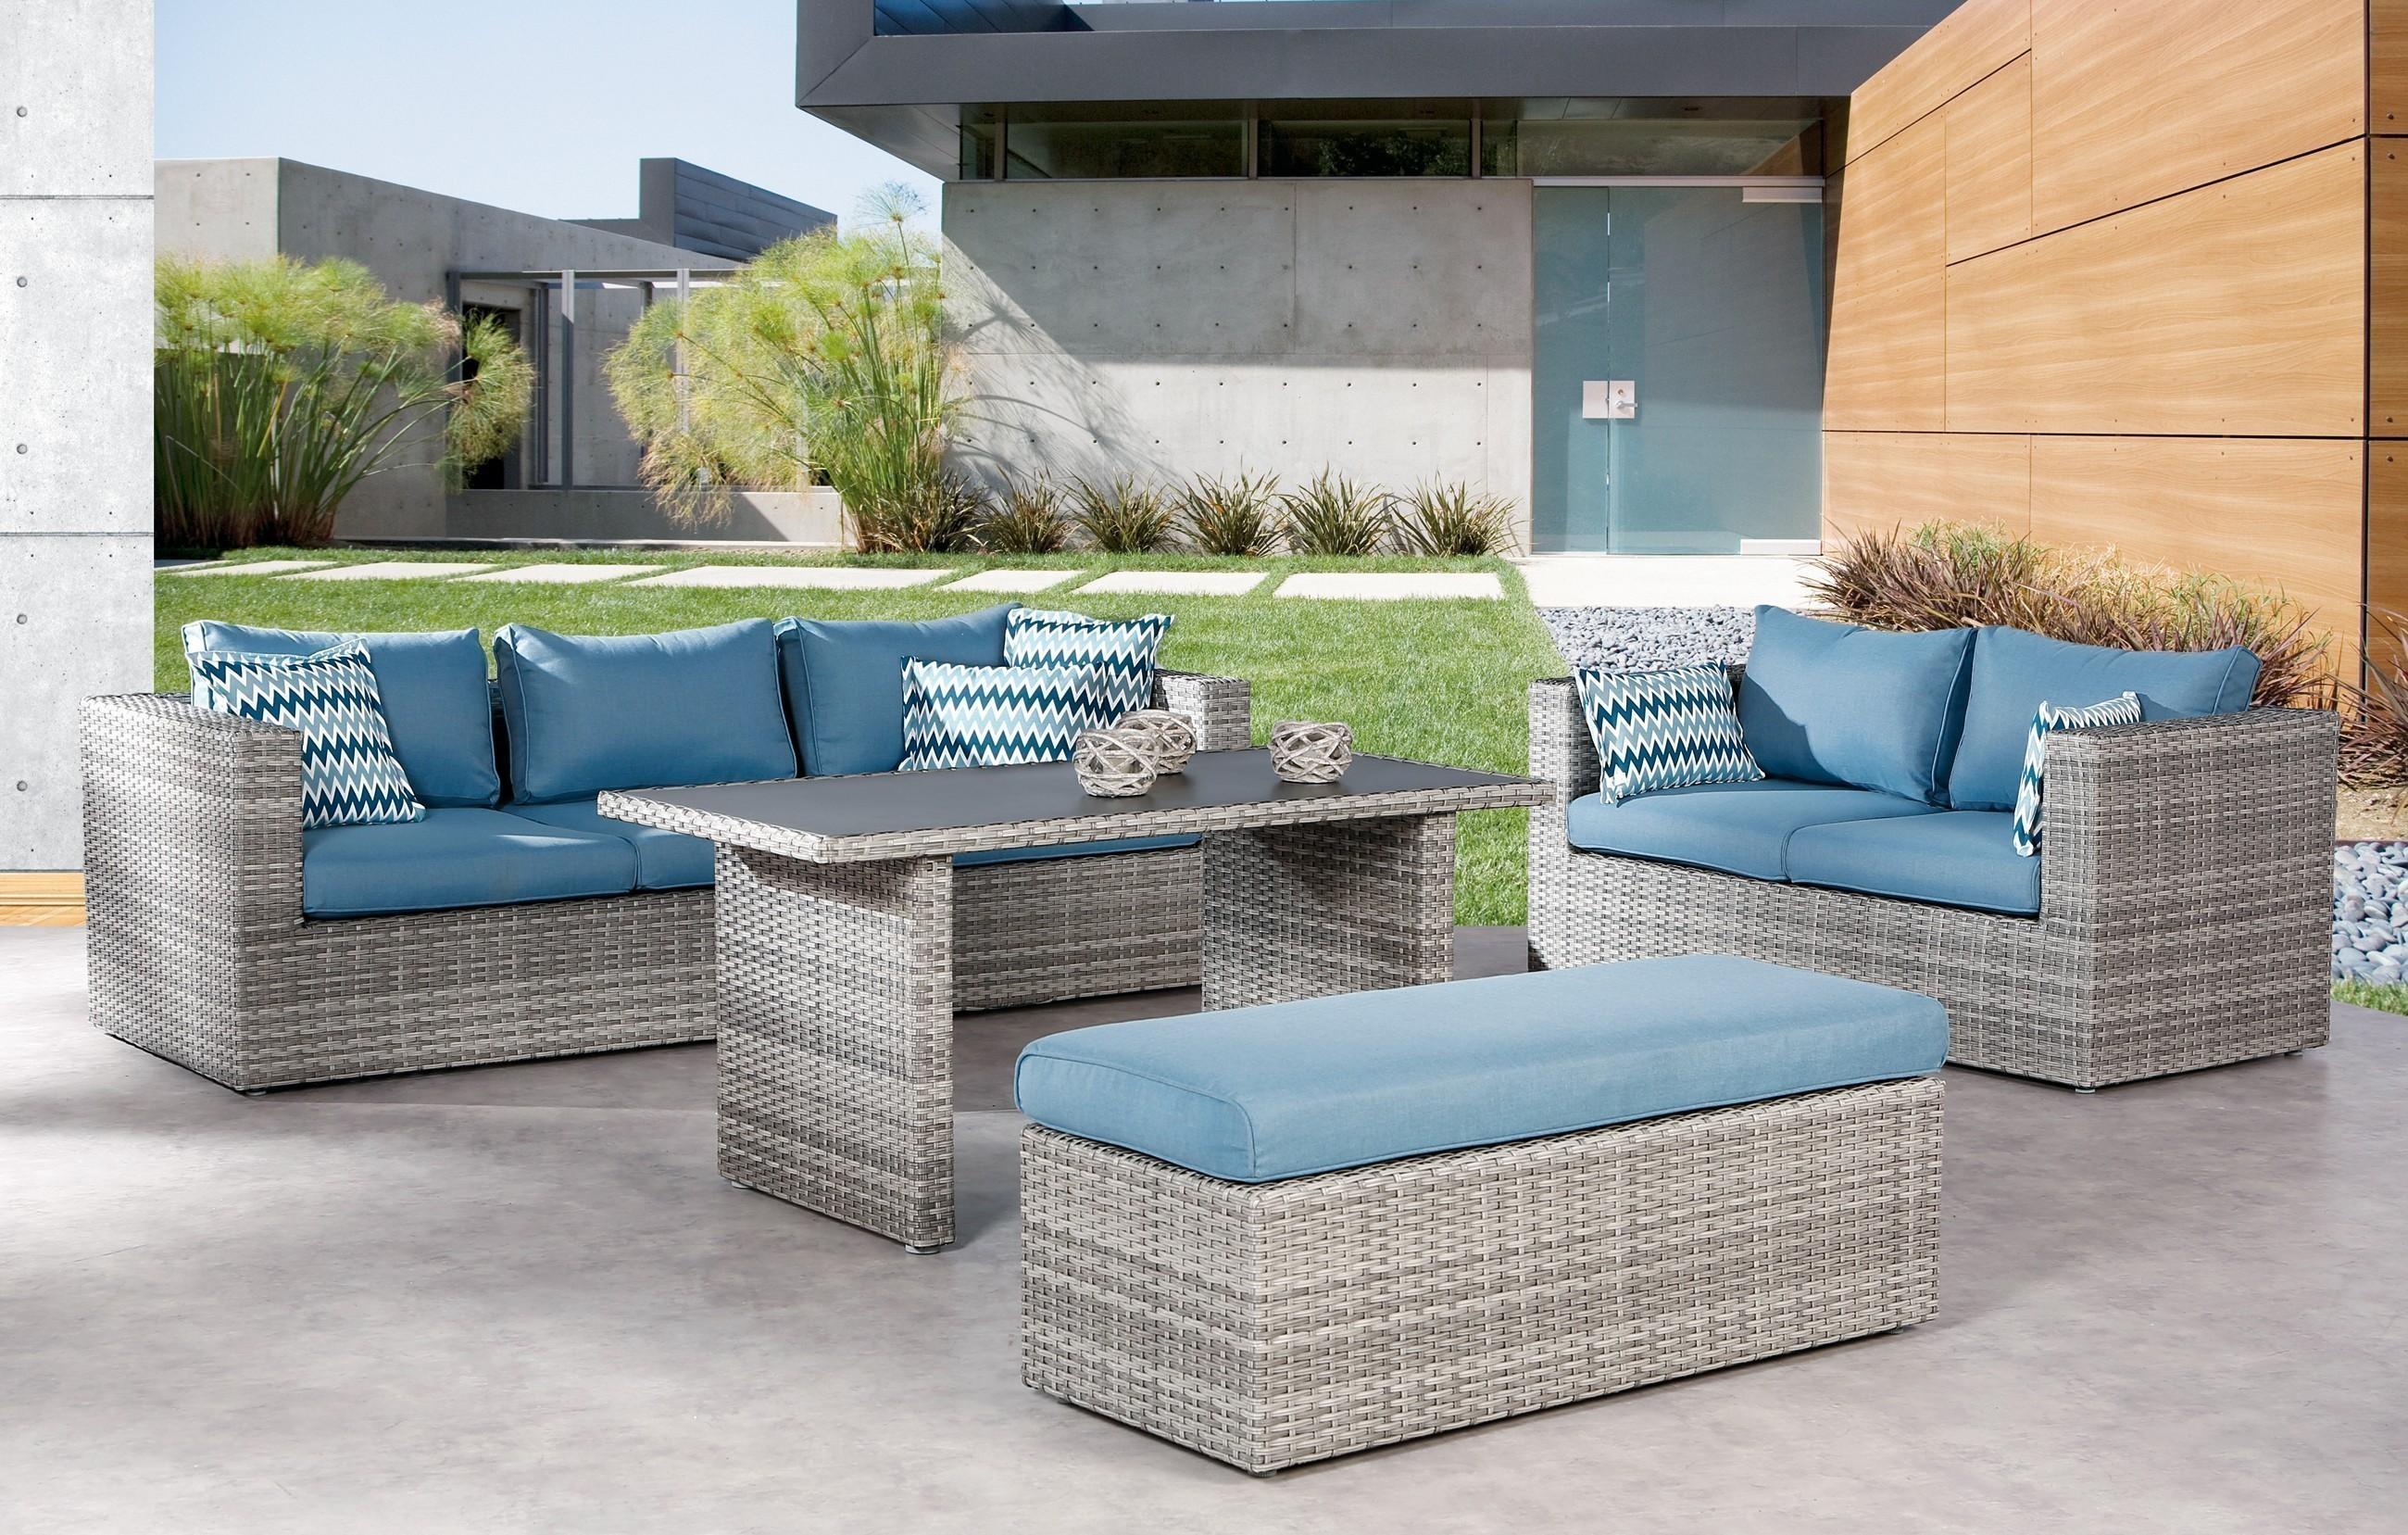 Gartenmöbel / Lounge Möbel Set Curacao Best Polyrattan grau / blau ...